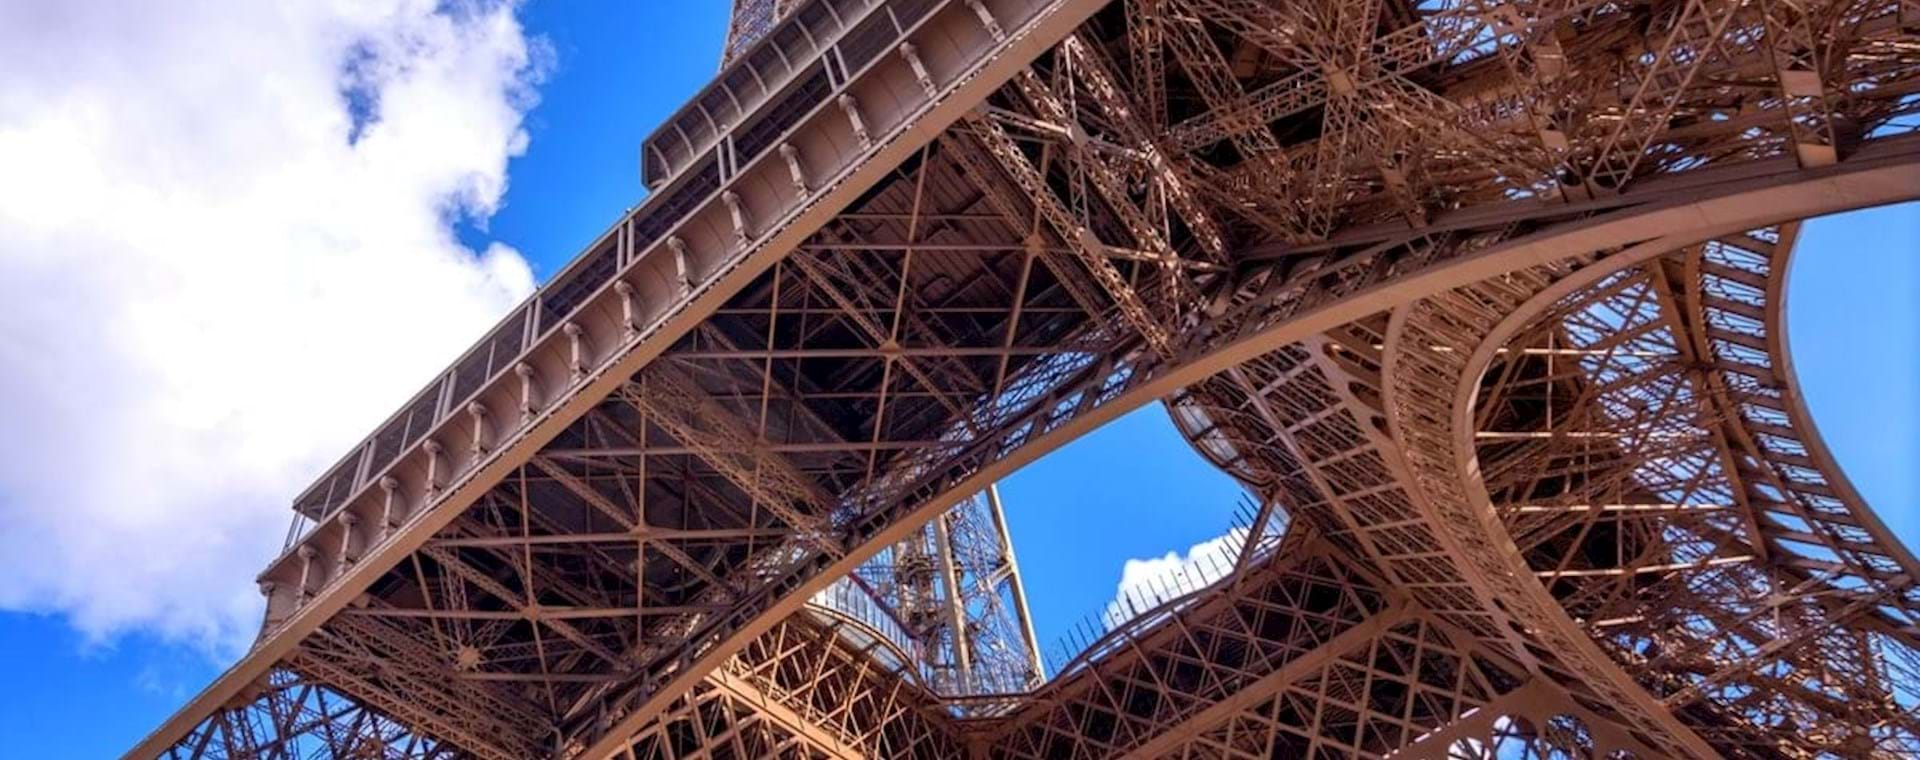 Eiffel Tower blue sky